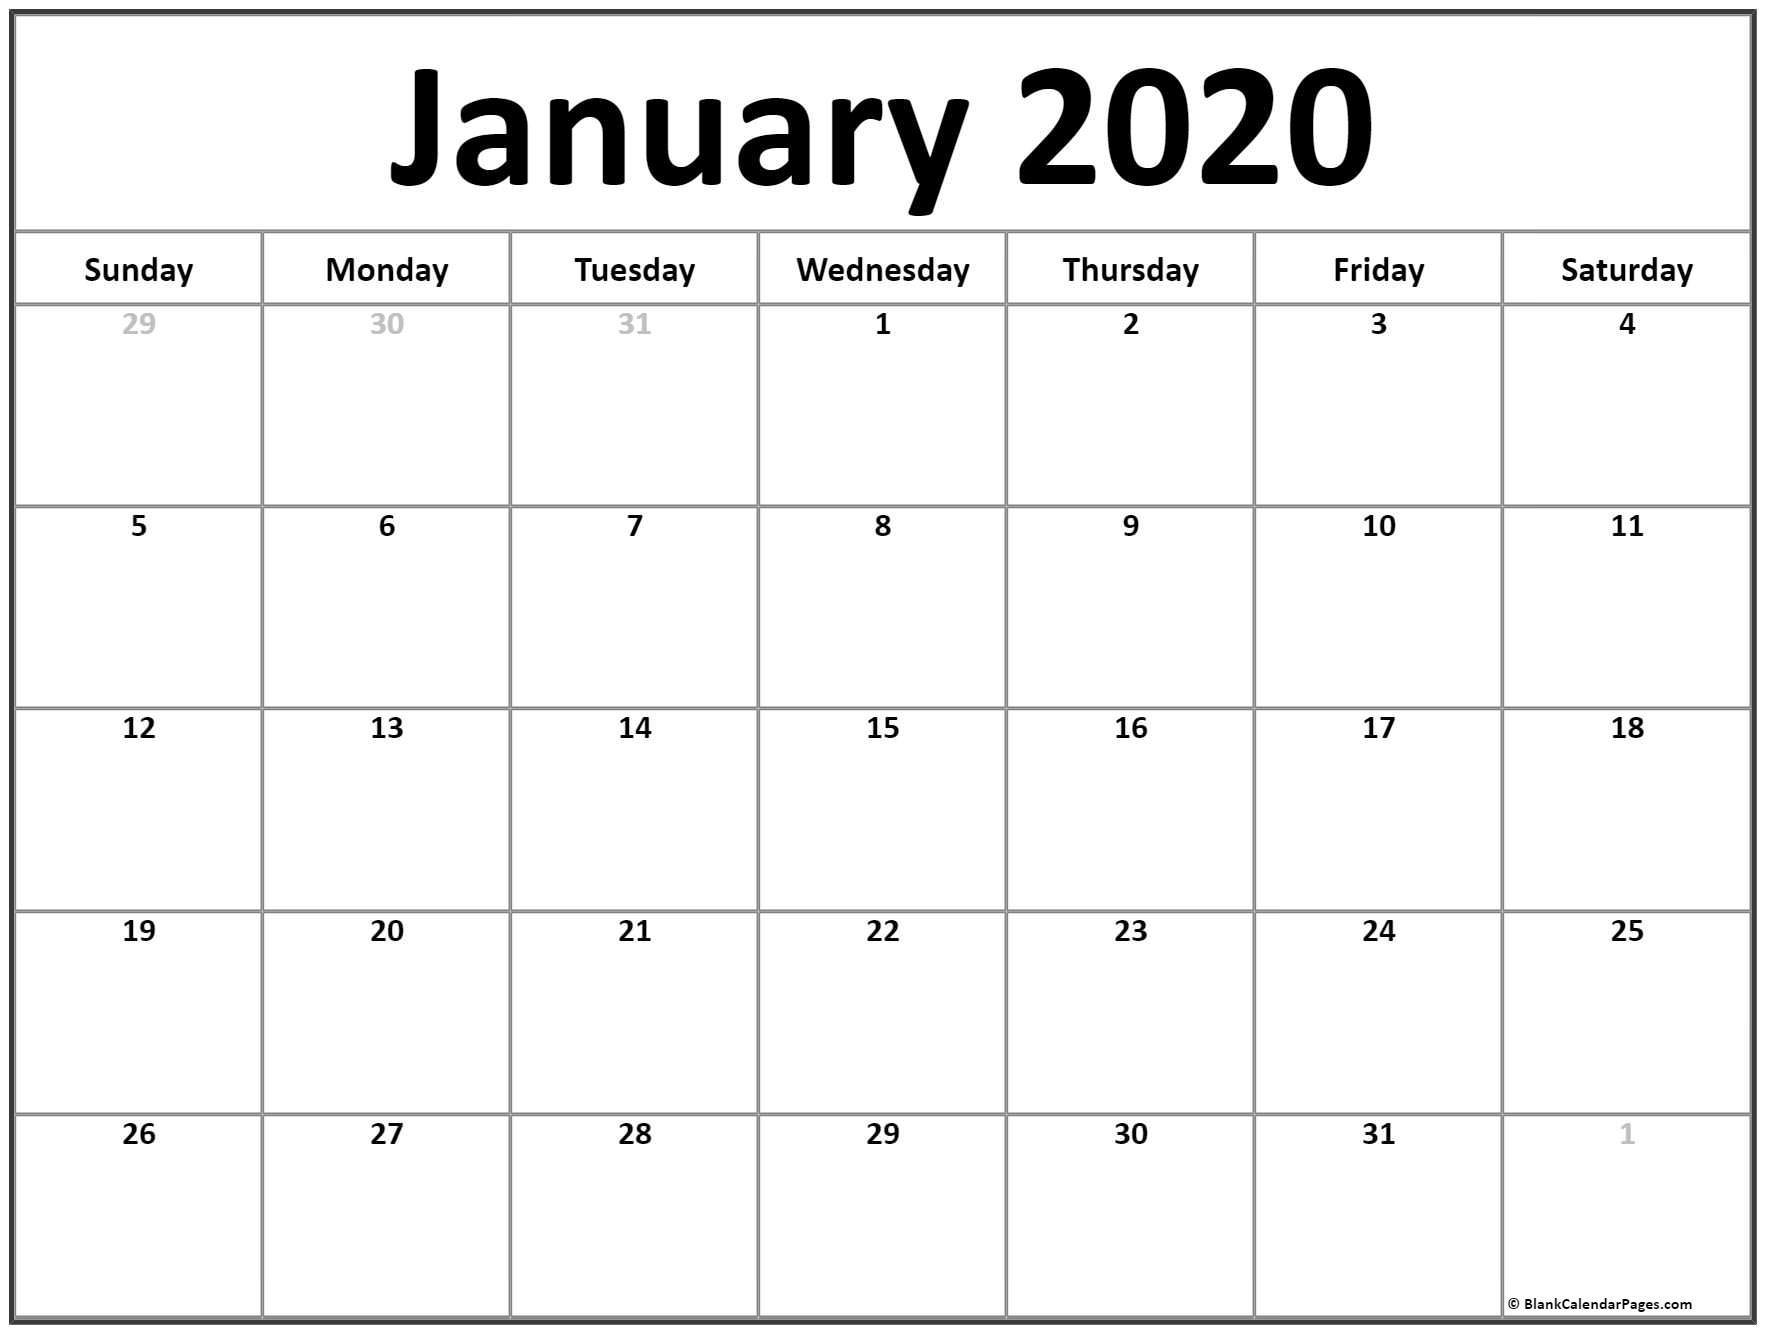 January 2020 Calendar B17 16 Calendar 2020 January - Calendar-January 2020 Calendar Kannada